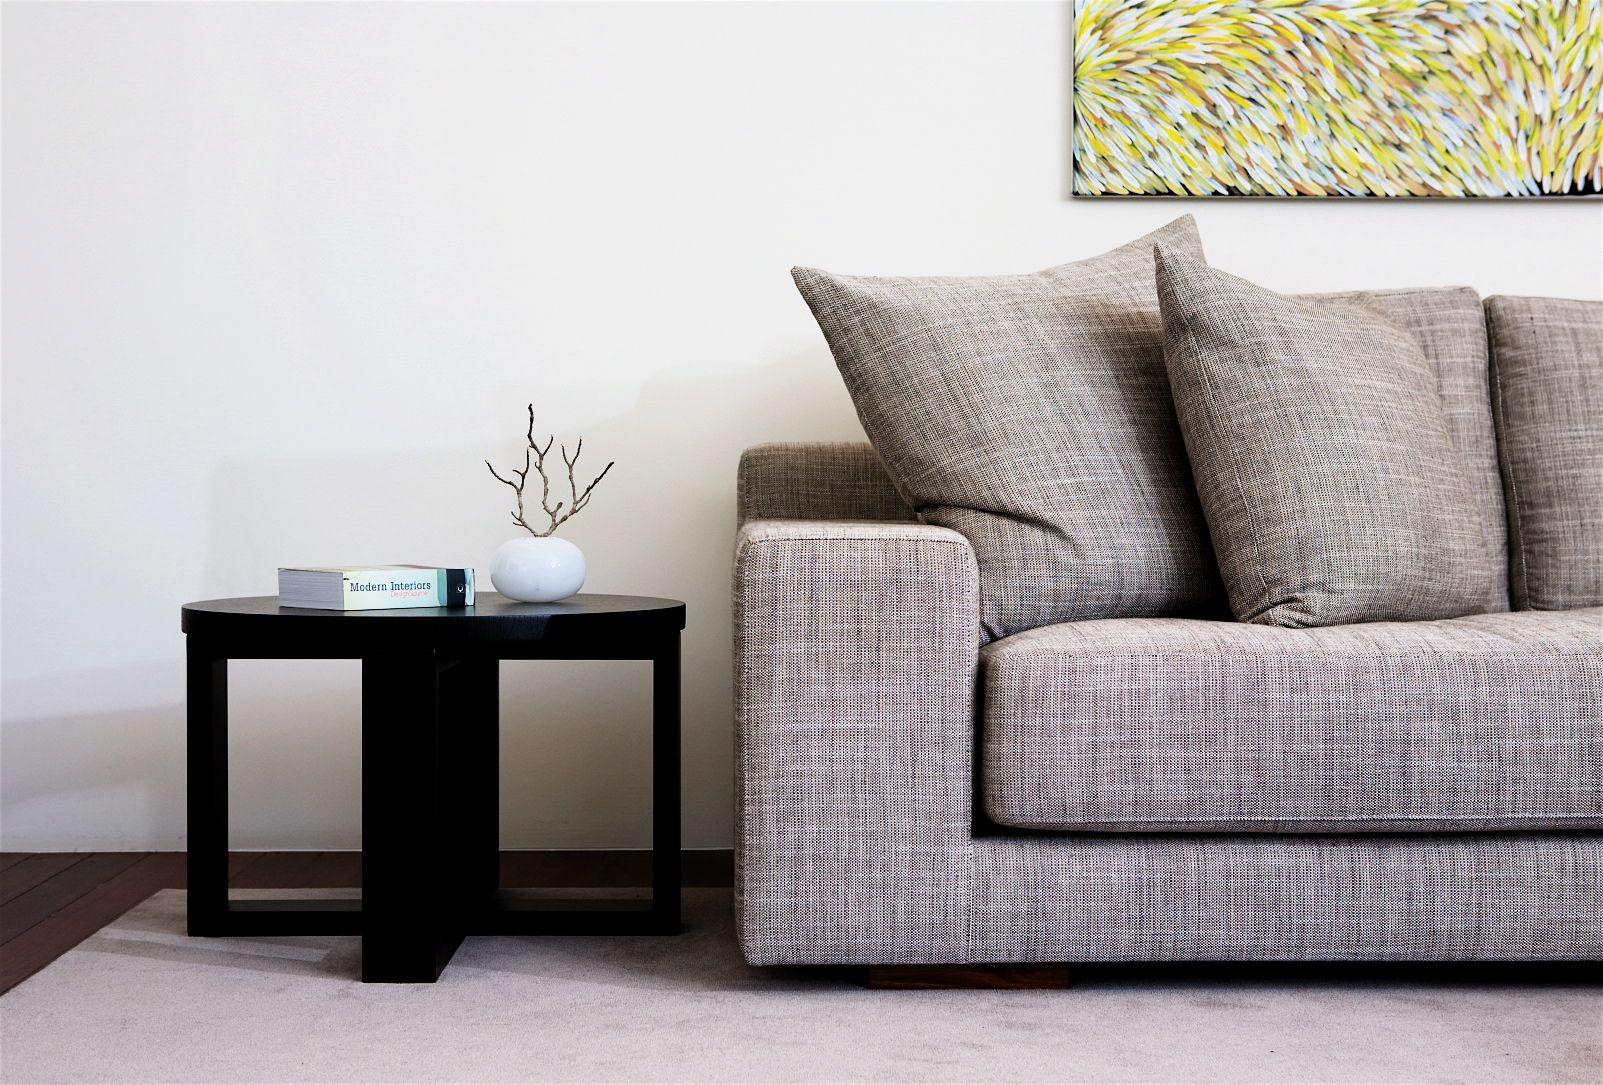 Eaglemont House Melbourne Australia Formal Sitting Room Featuring Empire Sofa By Jardan Covered In Furniture Living Room Inspiration Sideboard Furniture